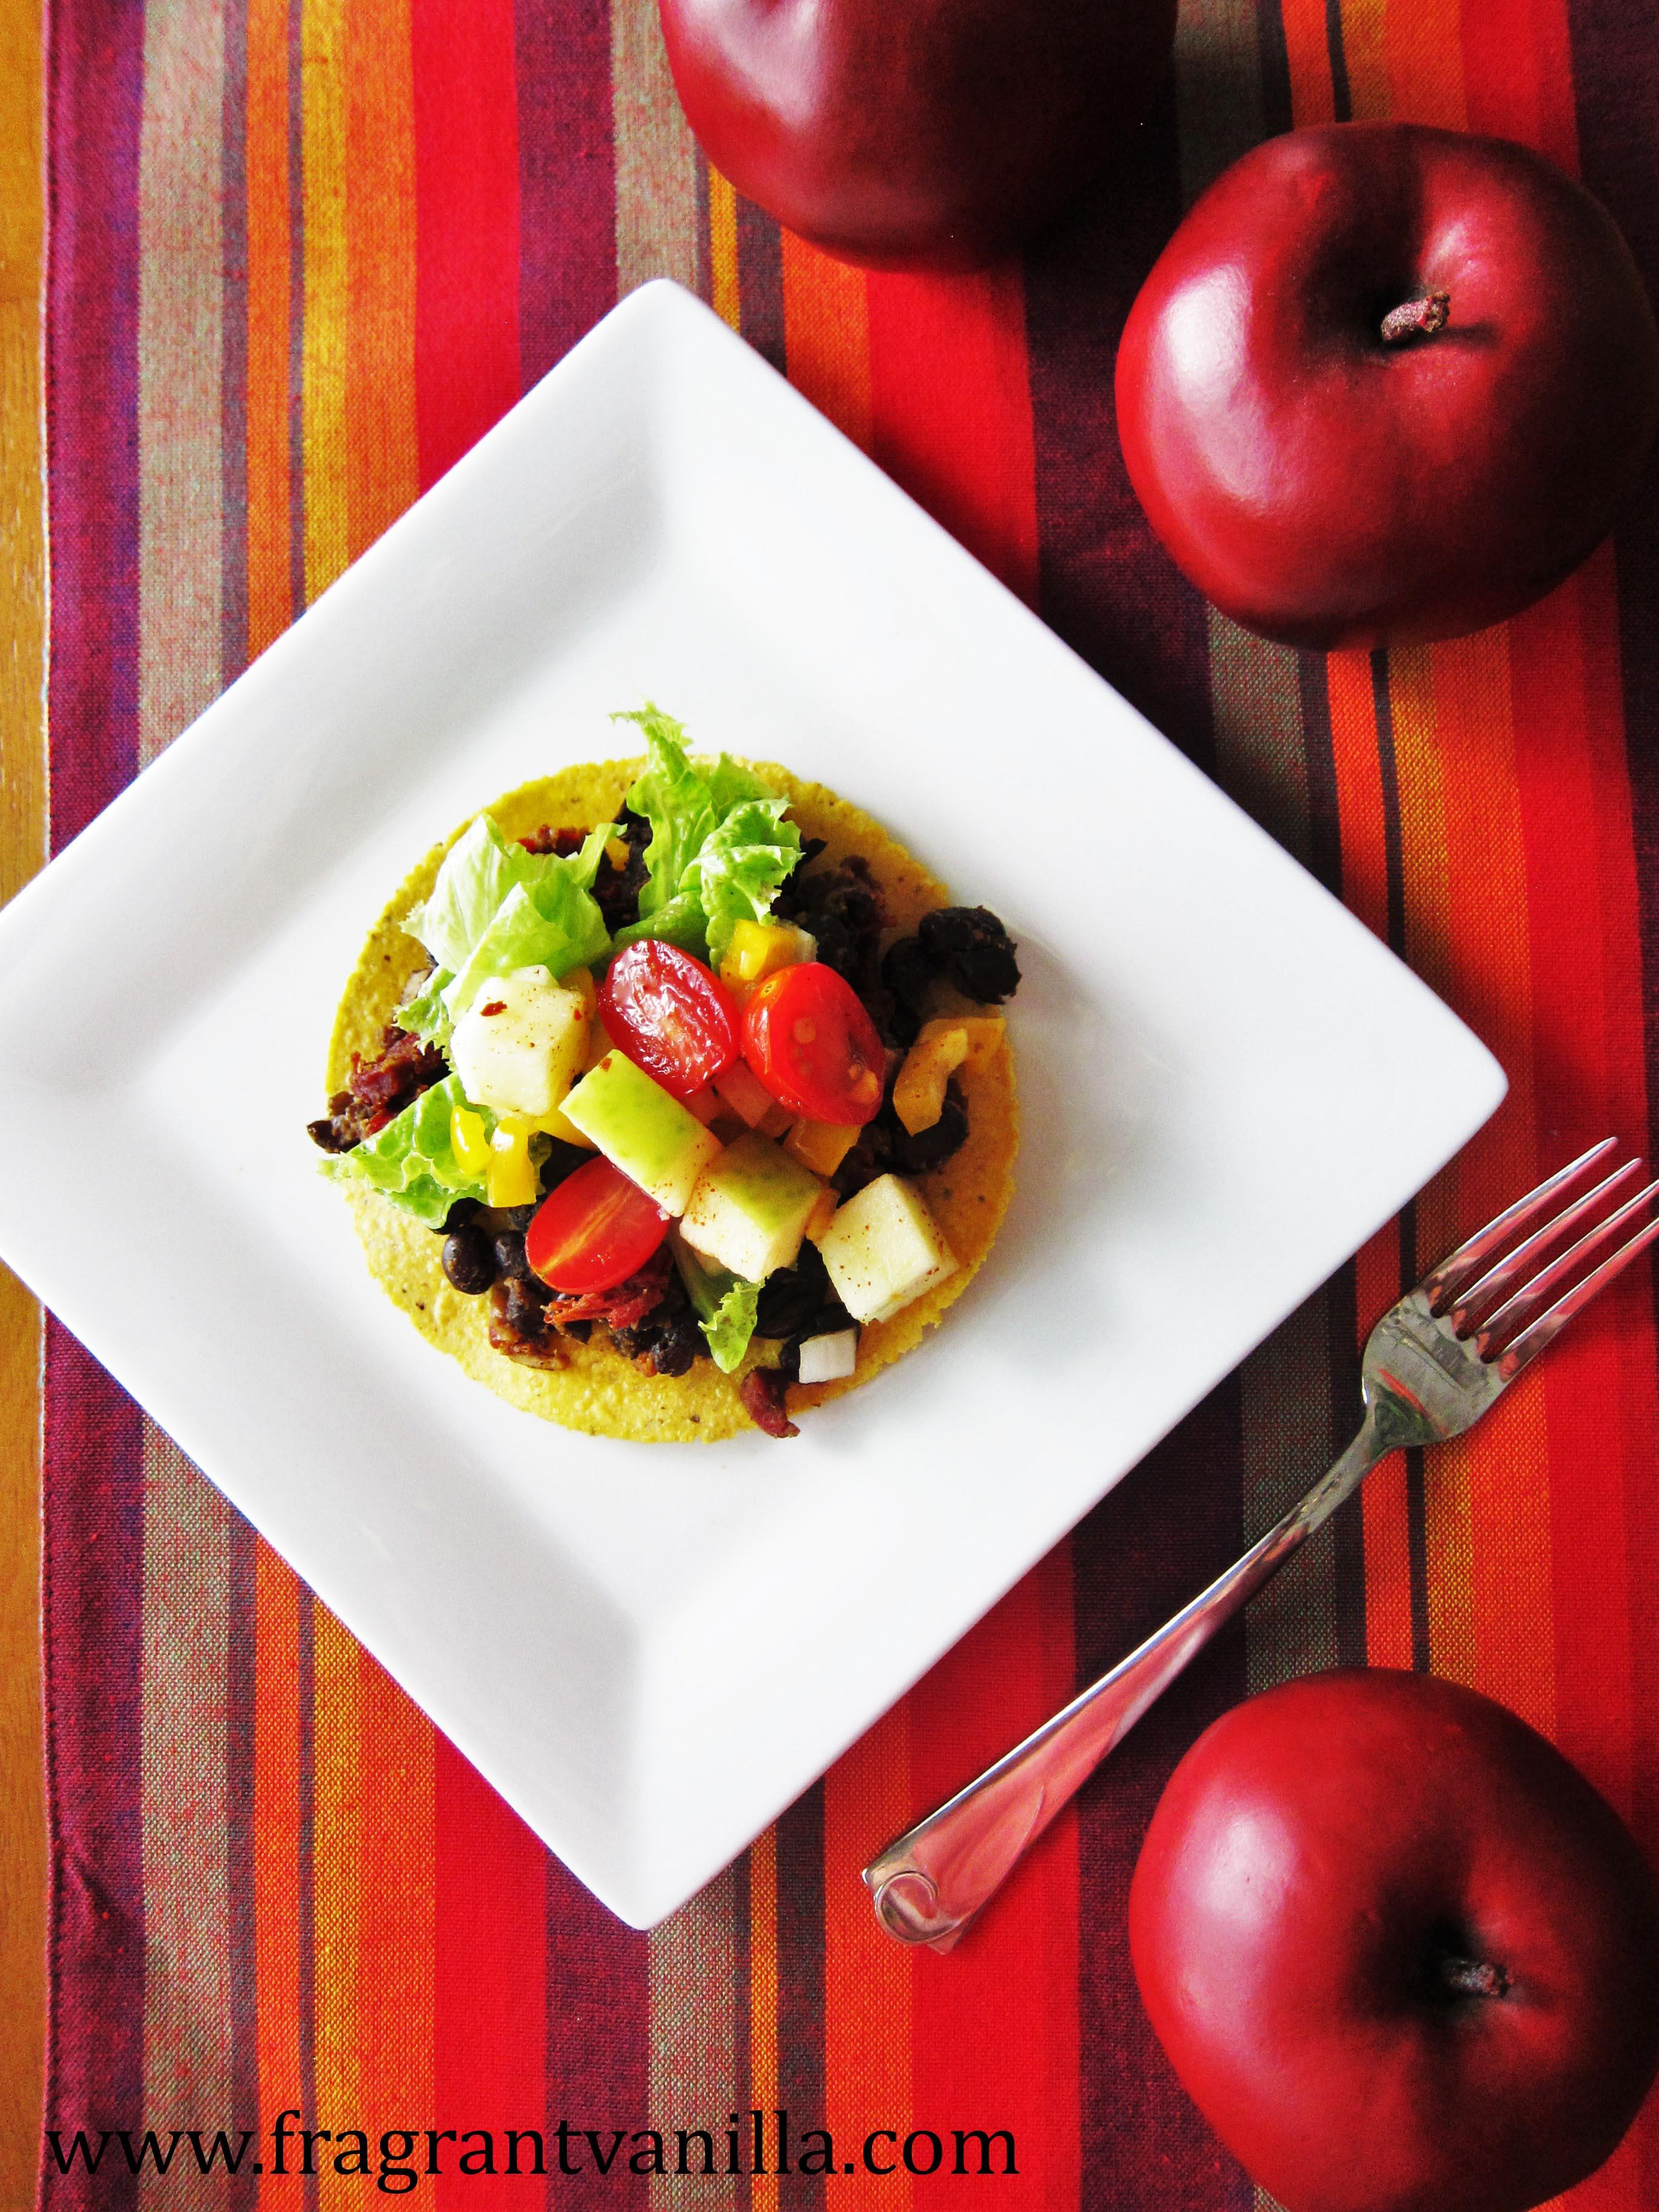 Vegan Black Bean Tostadas with Apple Salsa